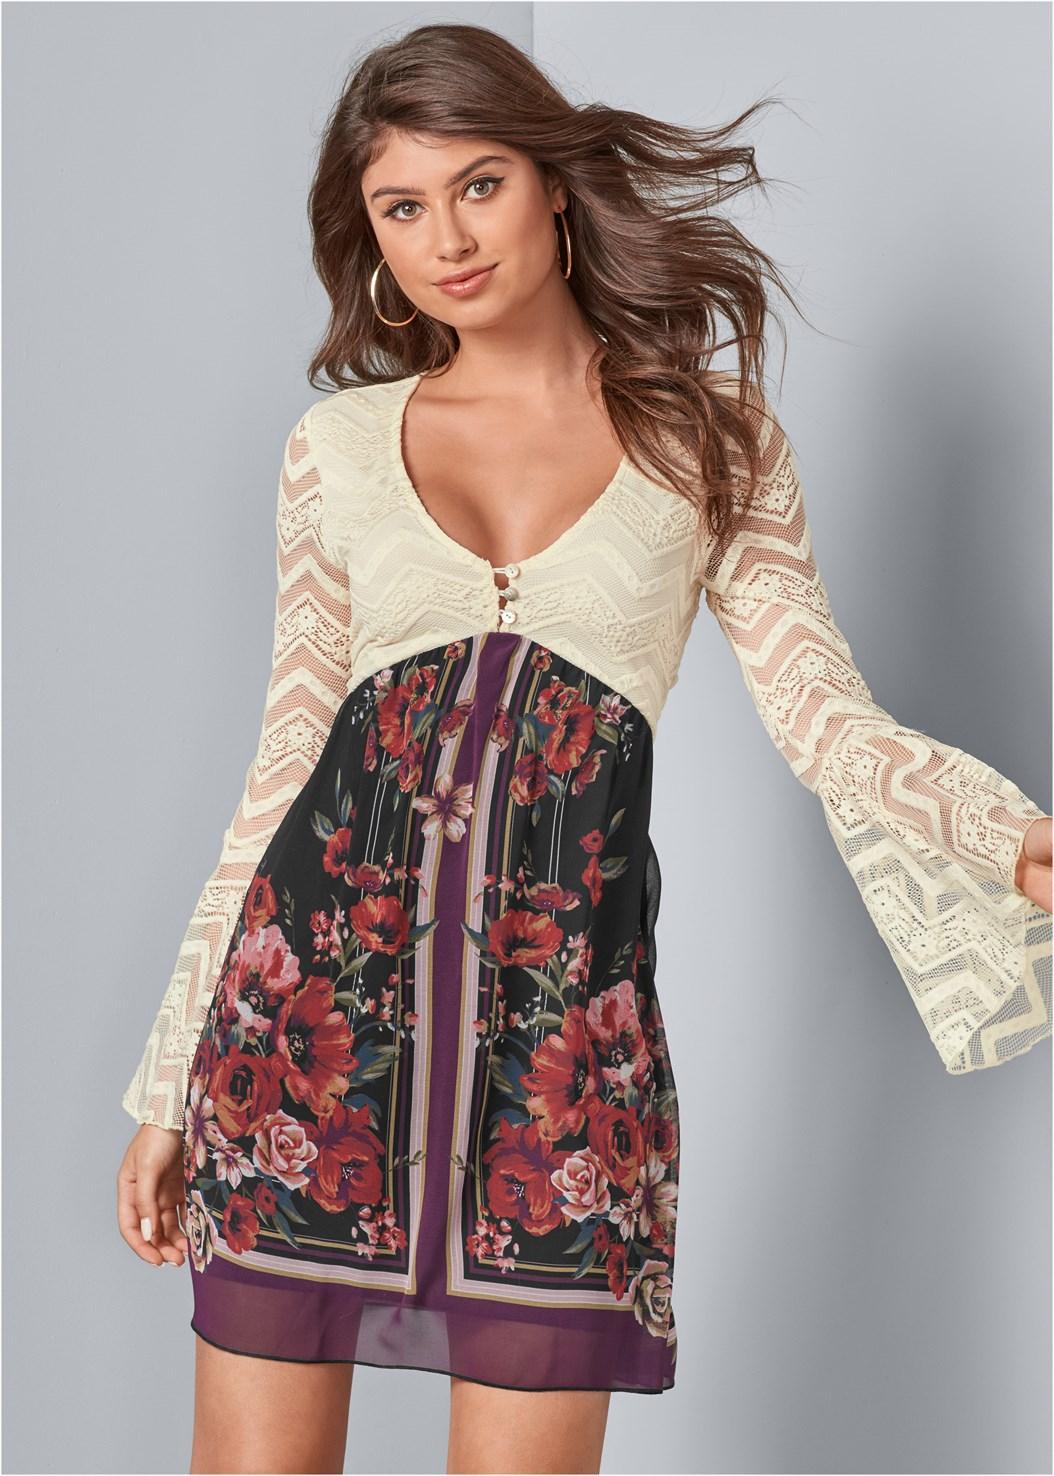 Lace Detail Dress,Push Up Bra Buy 2 For $40,Mixed Earring Set,Fringe Handbag